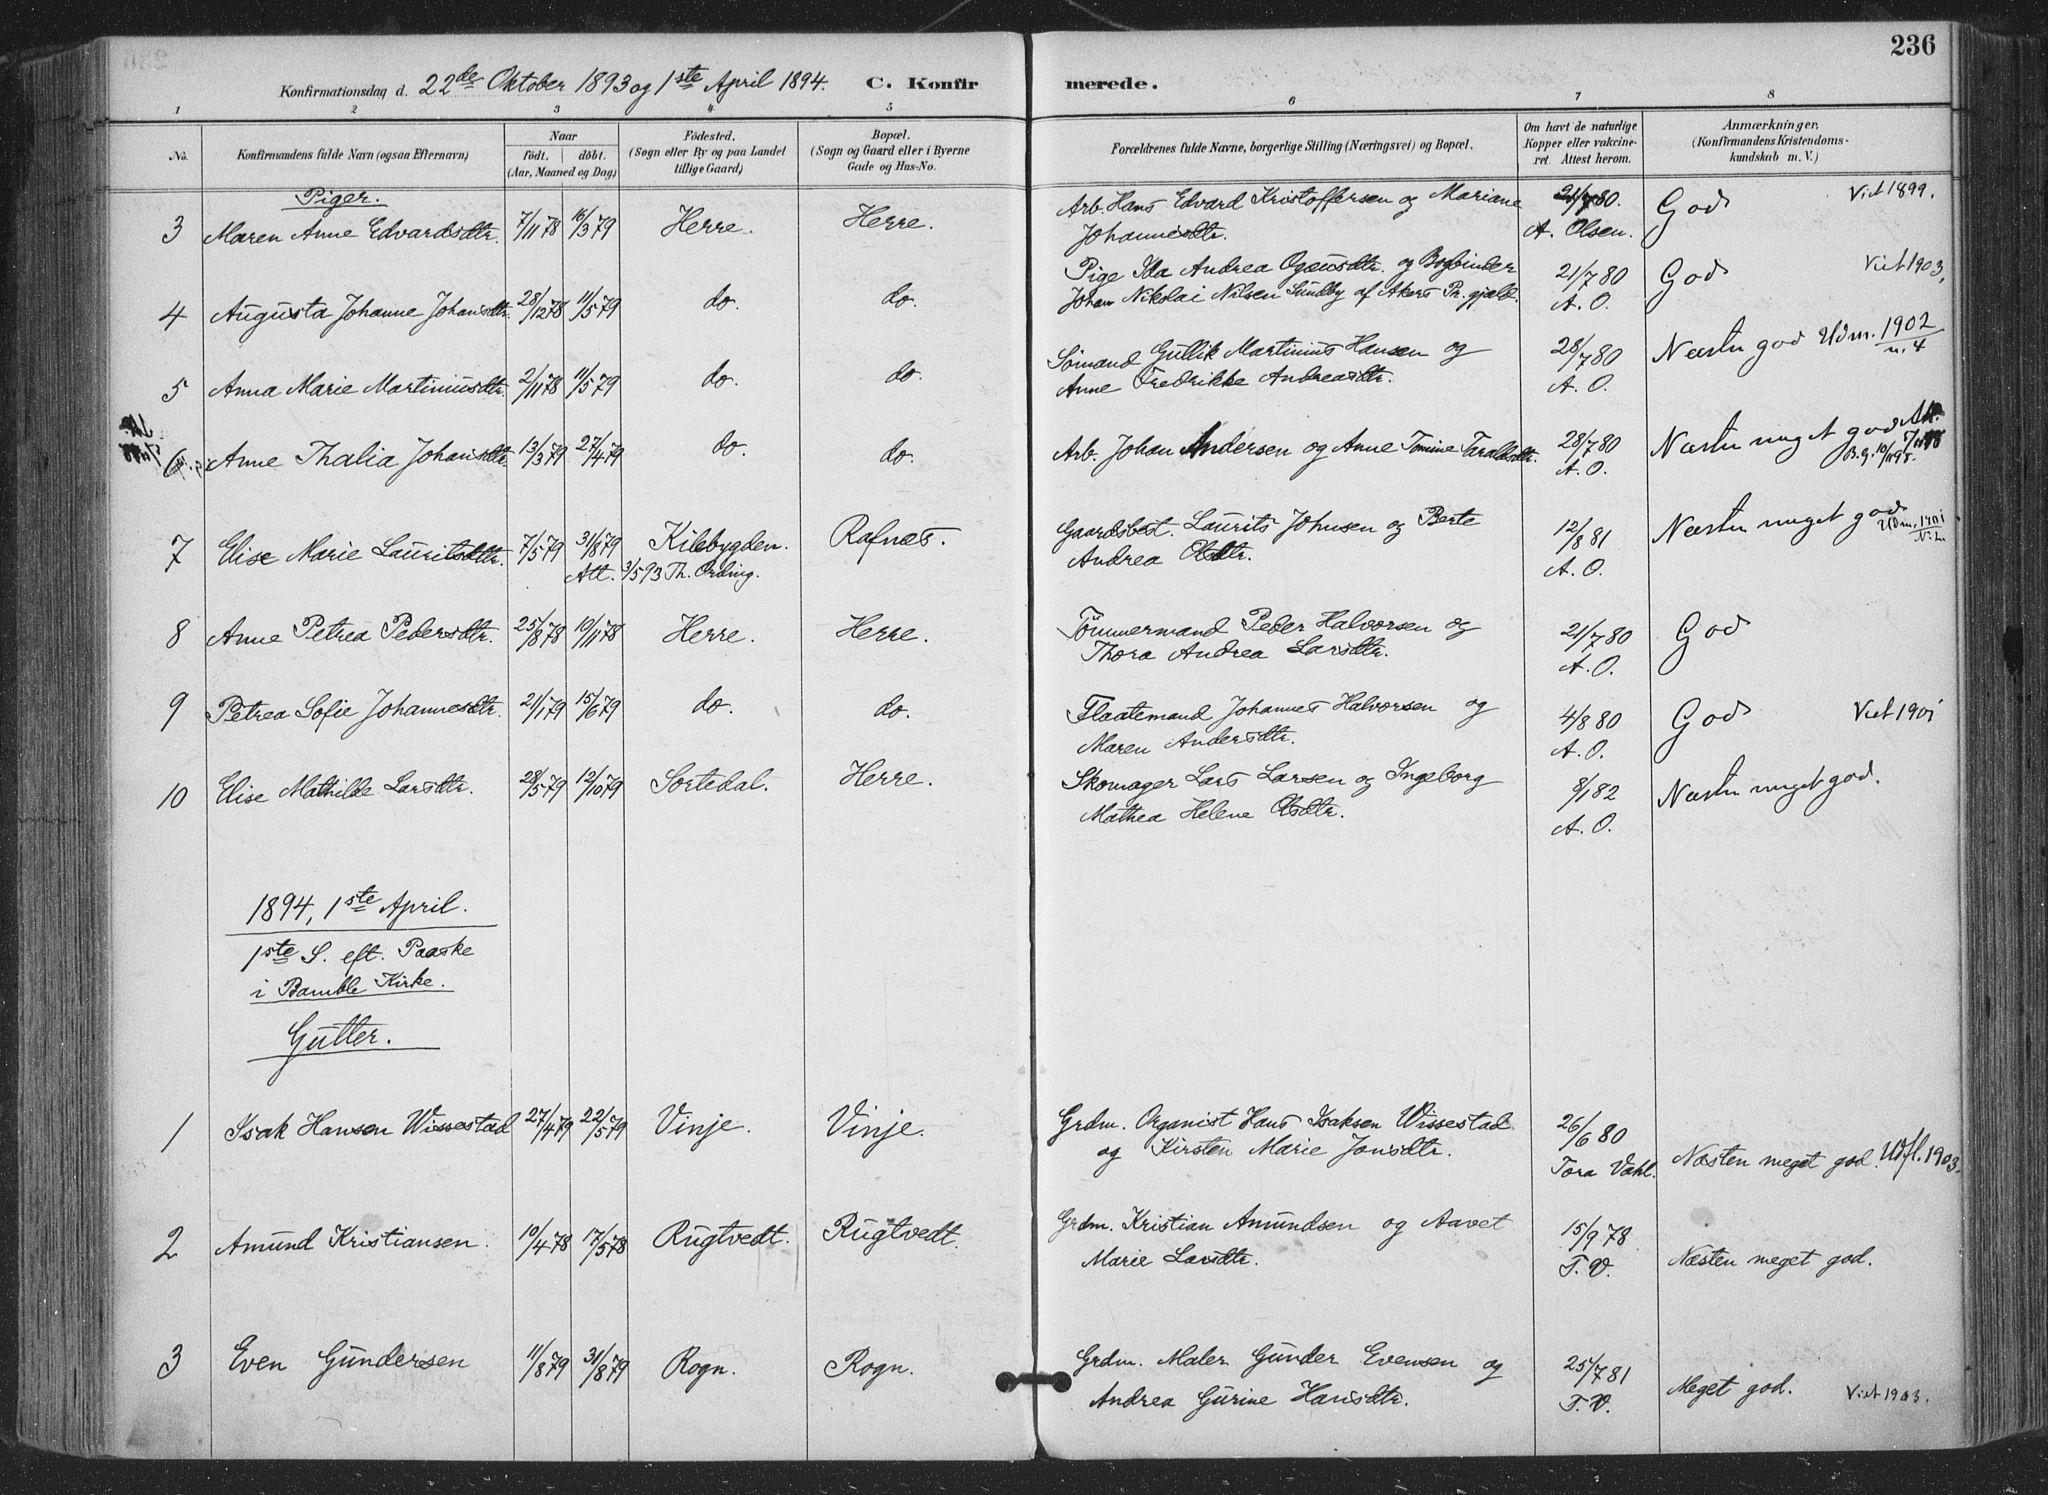 SAKO, Bamble kirkebøker, F/Fa/L0008: Ministerialbok nr. I 8, 1888-1900, s. 236